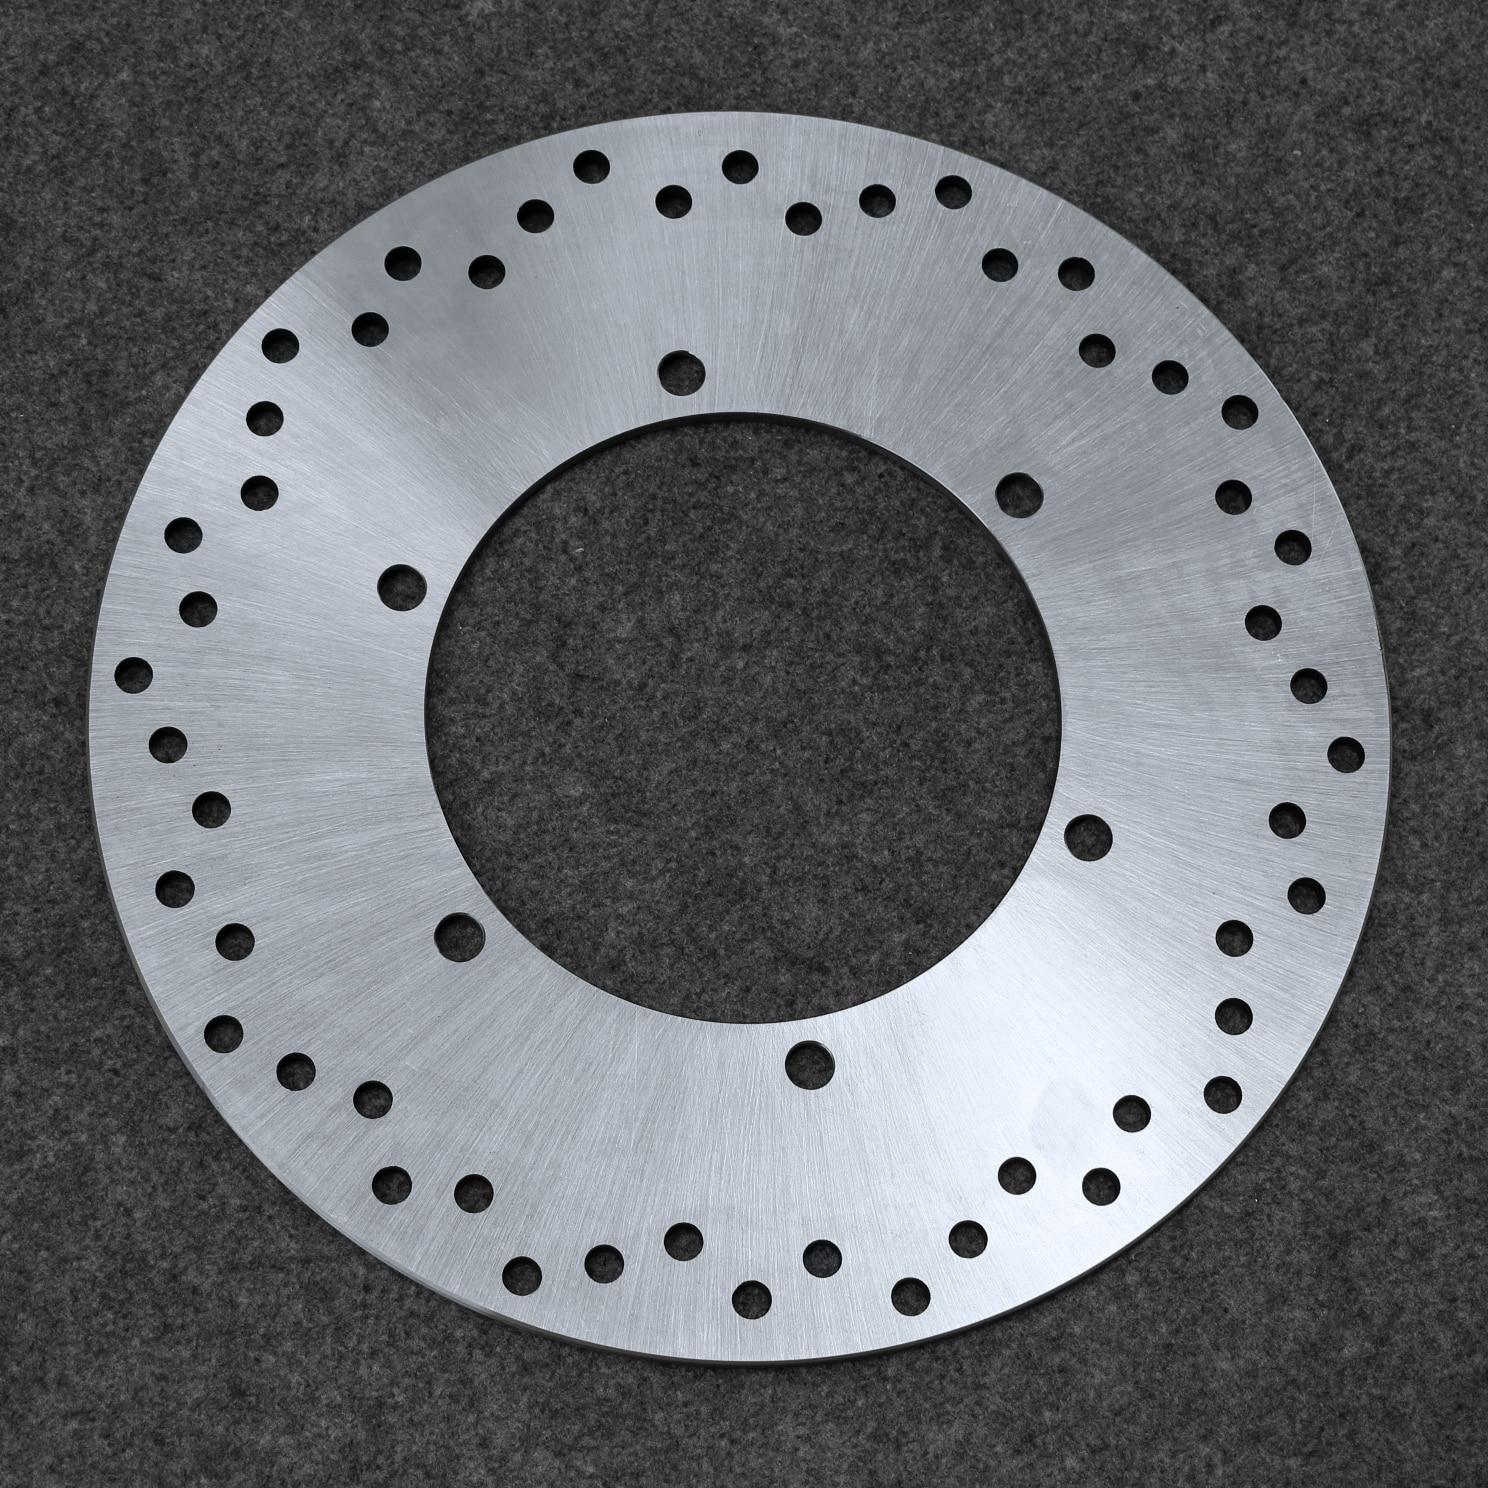 Rear Brake Disc Rotor Fit For VTX1300C VTX1300R/T VTX1300S- Retro 03-09 04 05 06Rear Brake Disc Rotor Fit For VTX1300C VTX1300R/T VTX1300S- Retro 03-09 04 05 06